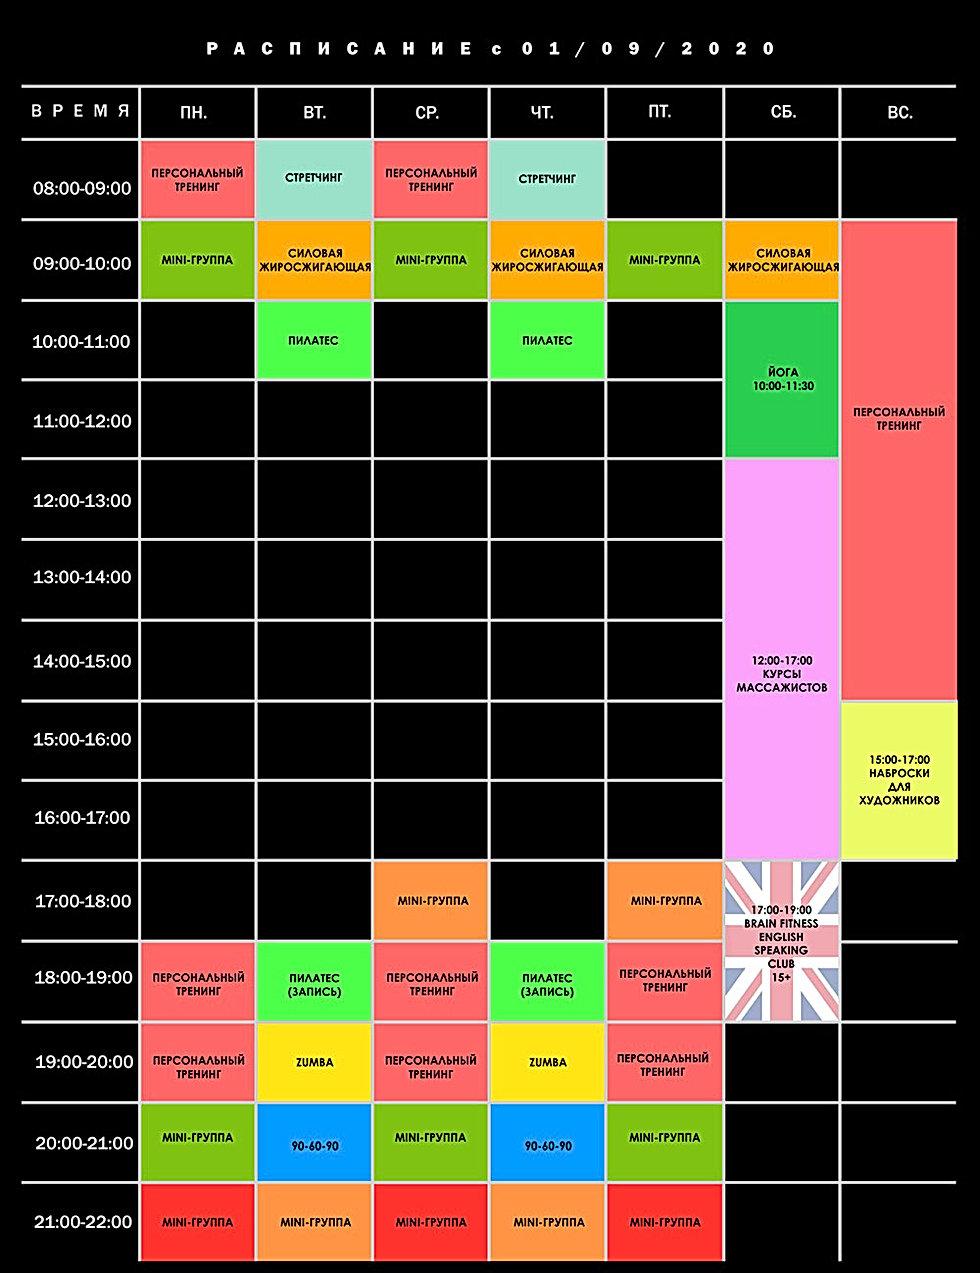 Timetable-1-9-20www.jpg